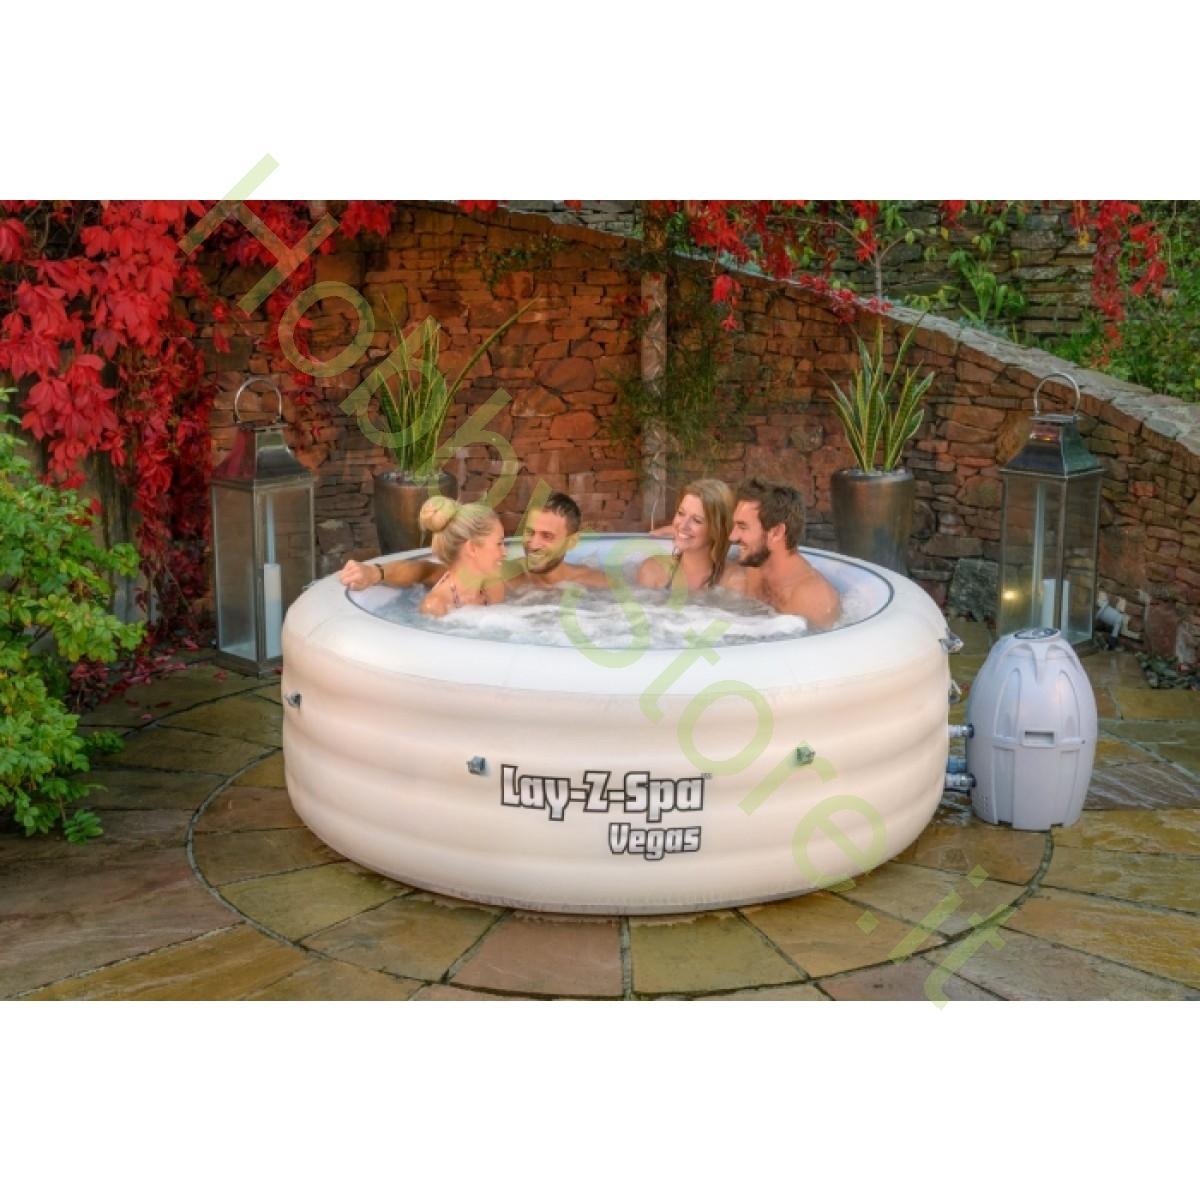 piscina idromassaggio lay z spa vegas a 451 11 iva inc. Black Bedroom Furniture Sets. Home Design Ideas